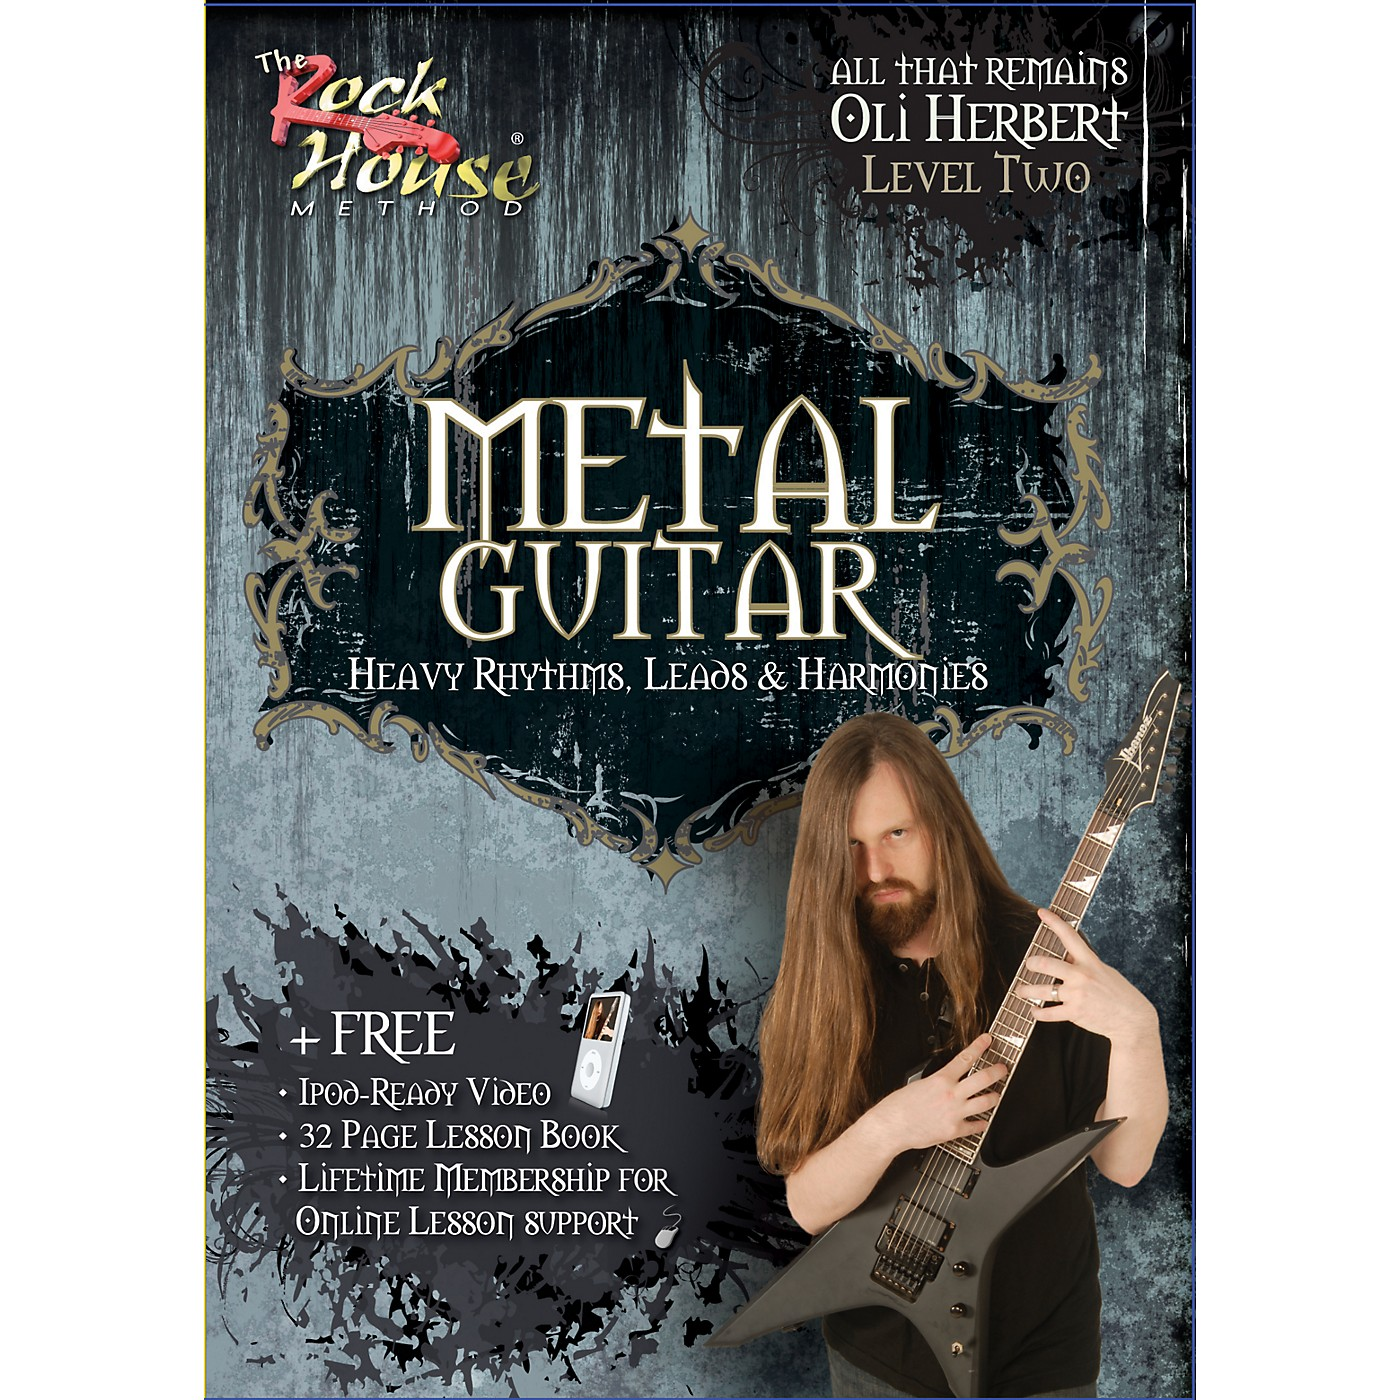 Hal Leonard Metal Guitar- Heavy Rhythms, Leads & Harmonies Level 2 with Oli Herbert of All That Remains (DVD) thumbnail